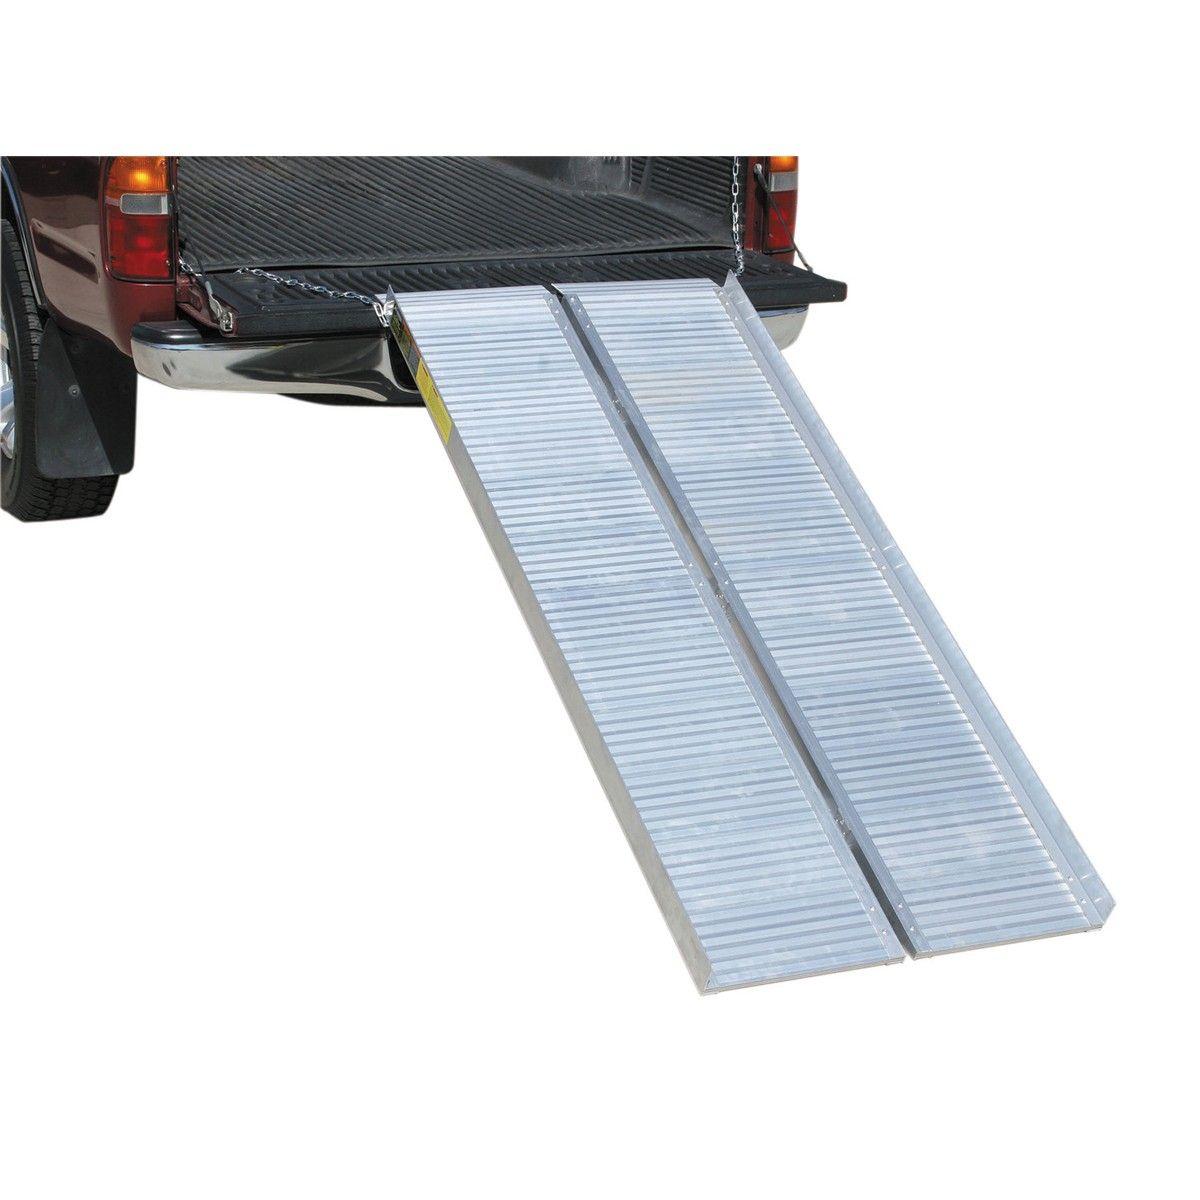 1200 Lb Capacity 30 1 4 In X 72 In Convertible Aluminum Loading